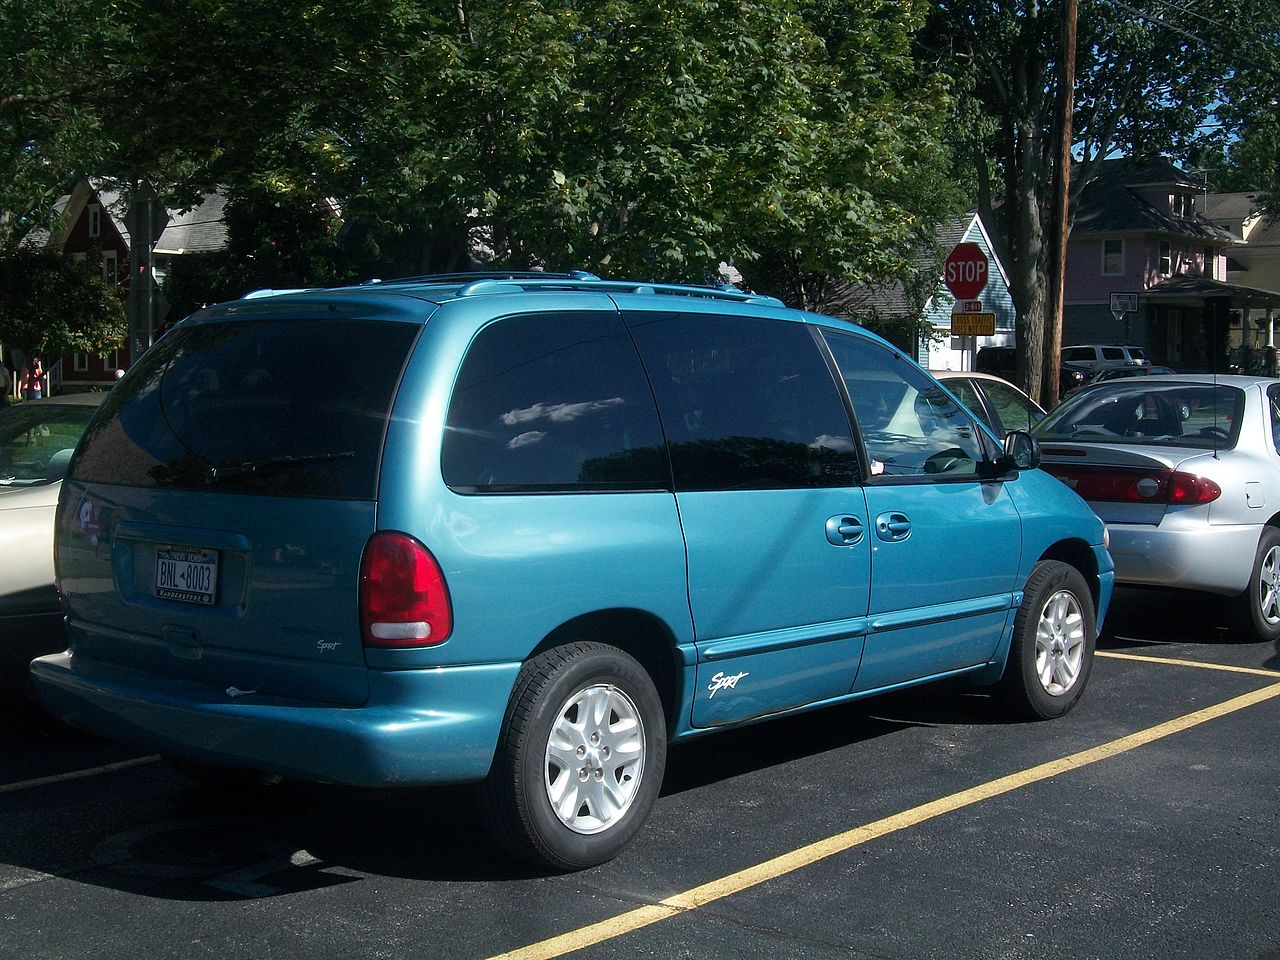 Dodge dodge 1999 caravan : File:1999 Dodge Grand Caravan Sport.JPG - Wikimedia Commons